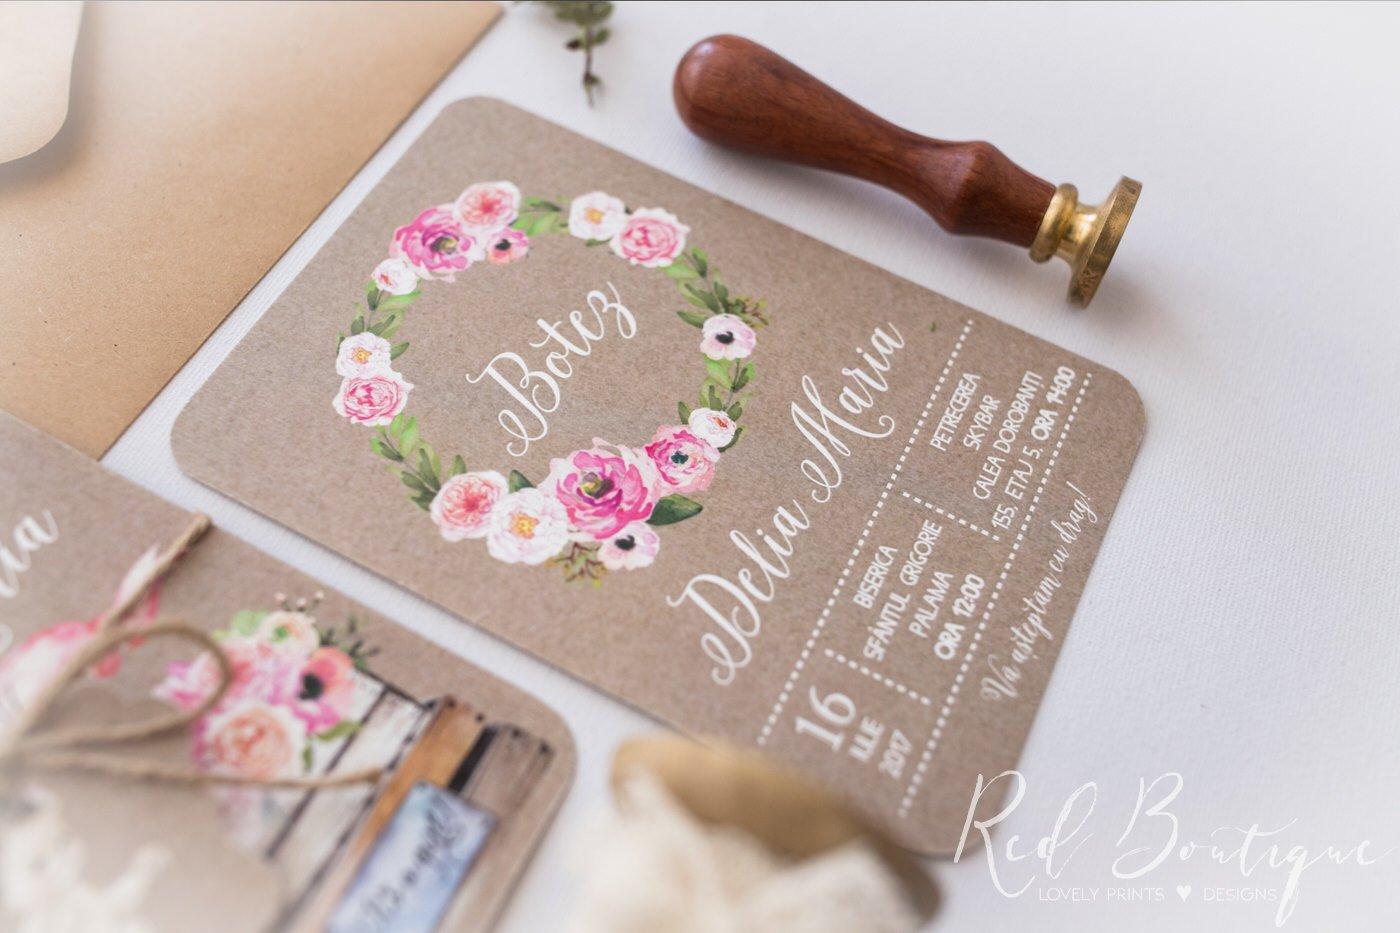 invitatie vintage cu fetita si coronita din flori rozinvitatie vintage cu fetita si coronita din flori roz